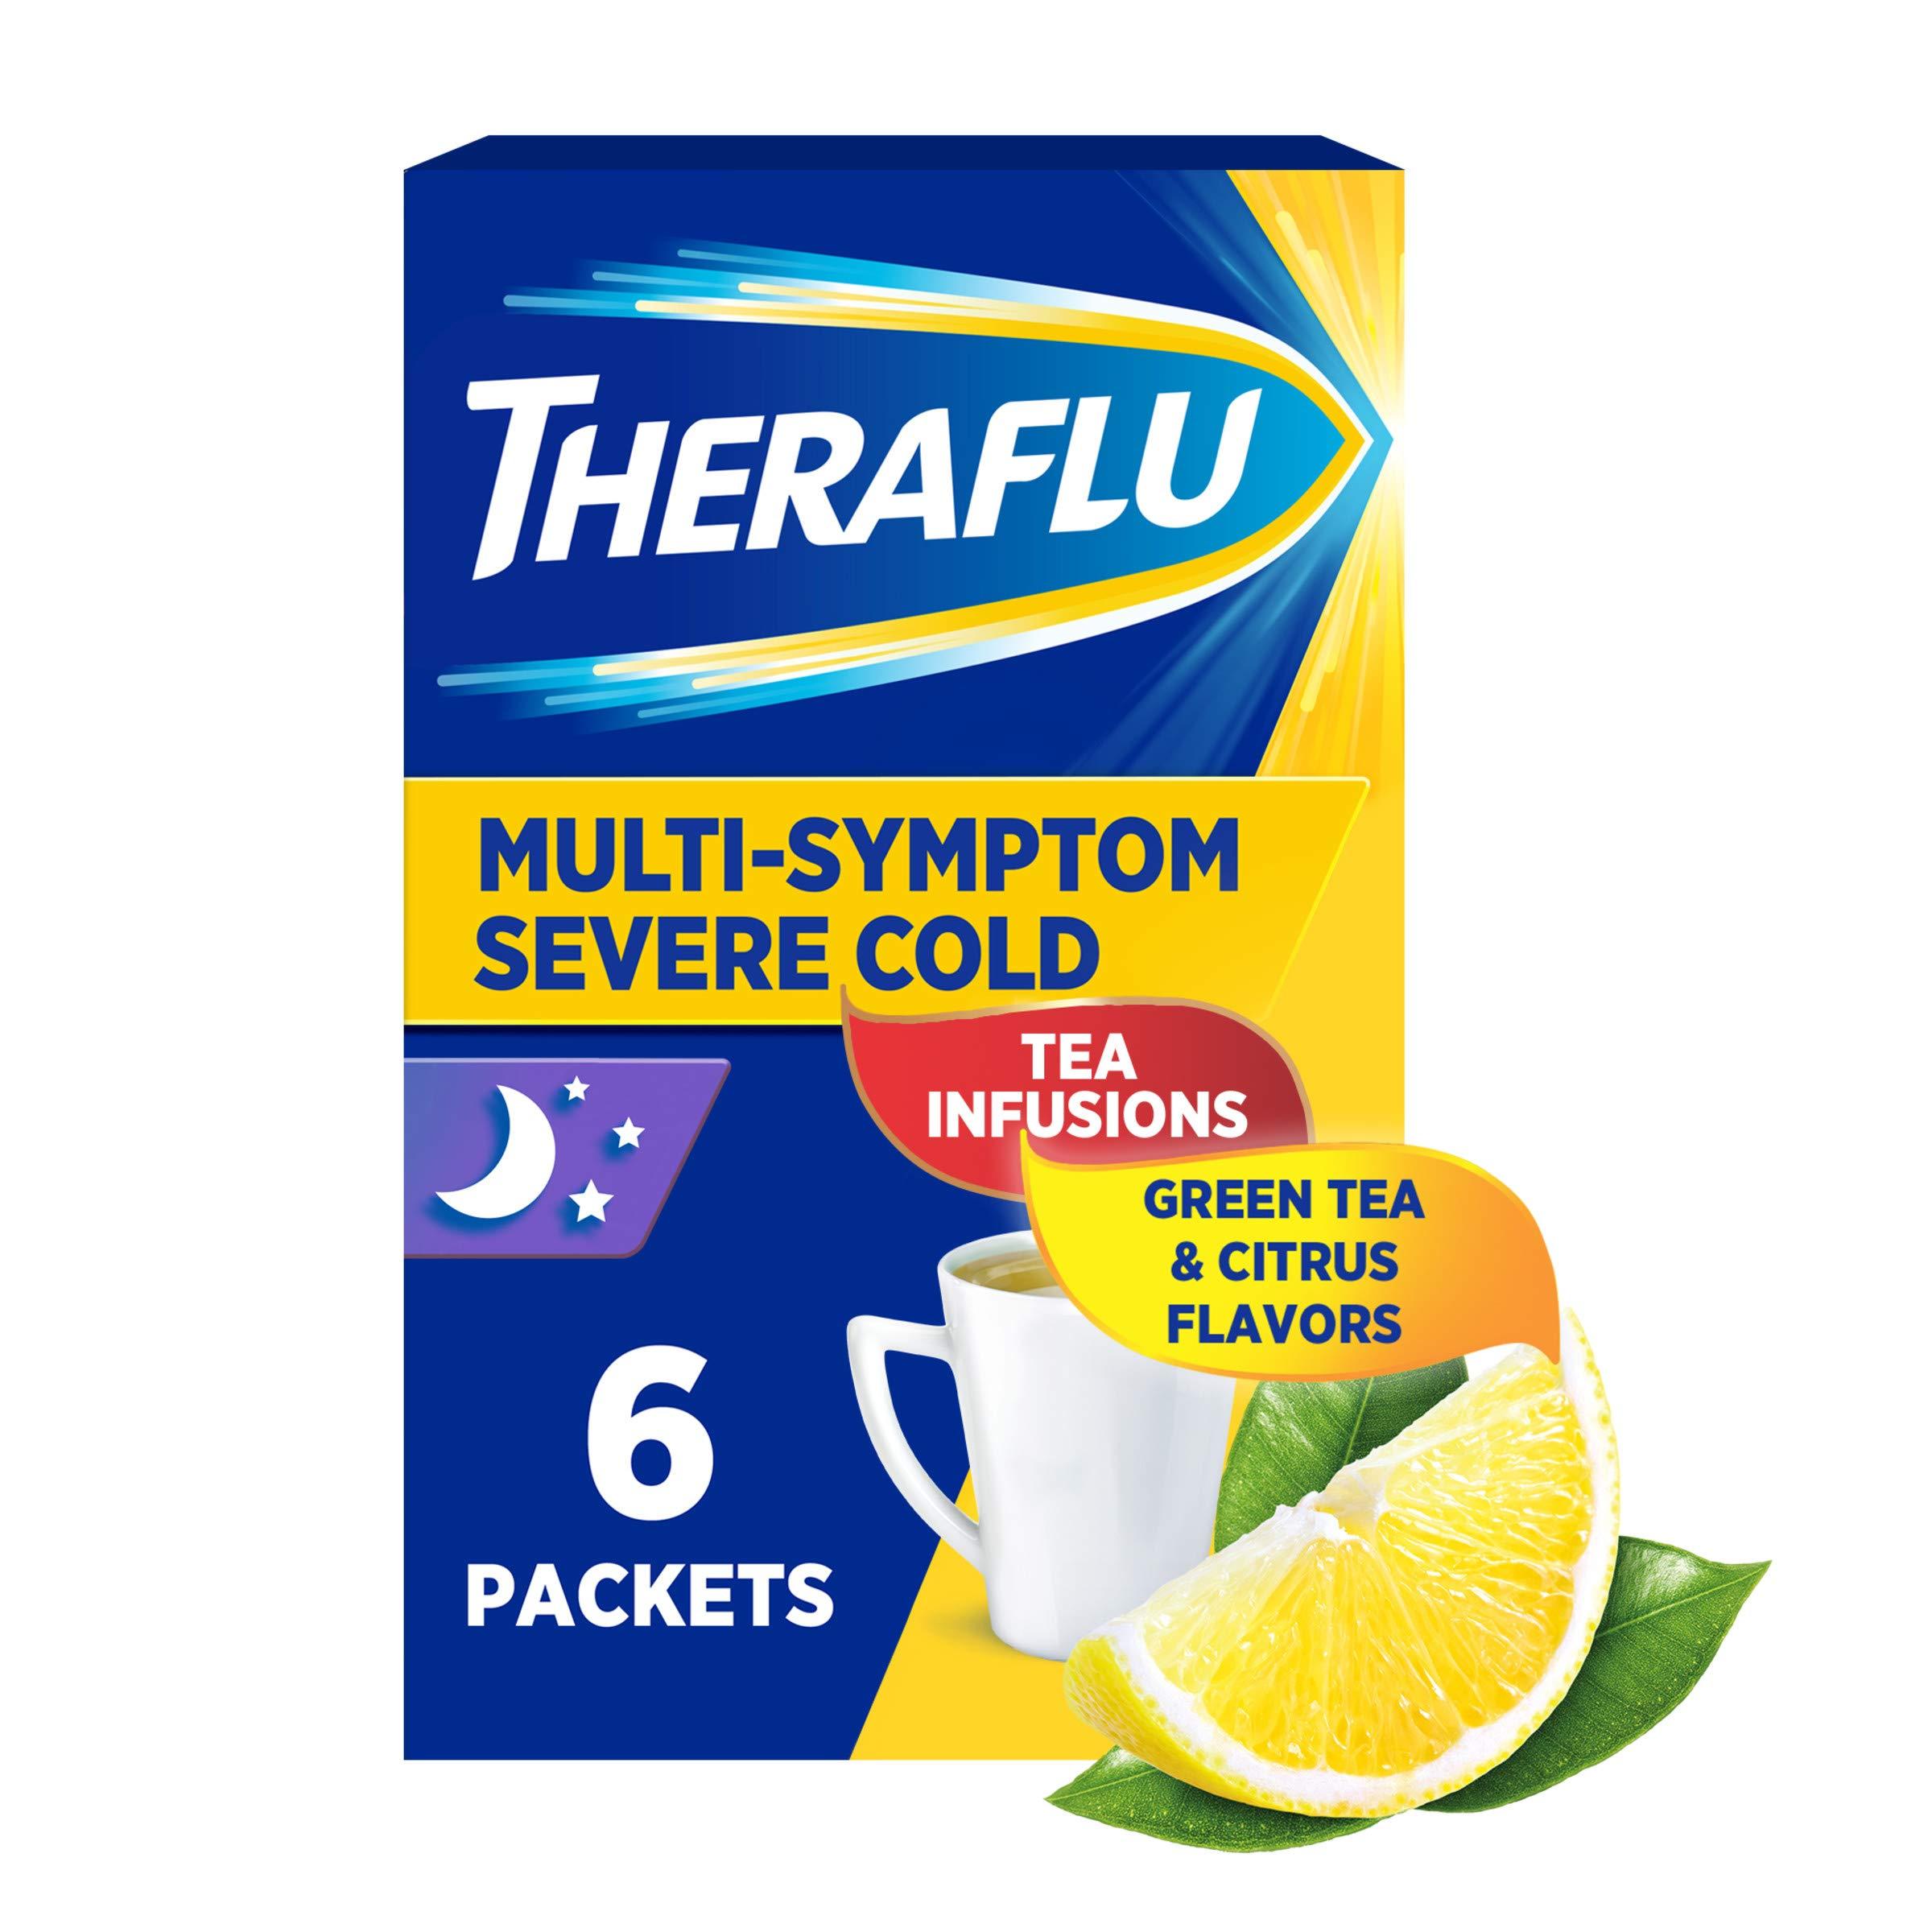 Theraflu Nighttime Multi-Symptom Severe Cold Hot Liquid Powder Green Tea and Citrus Flavors Box, 6 Count